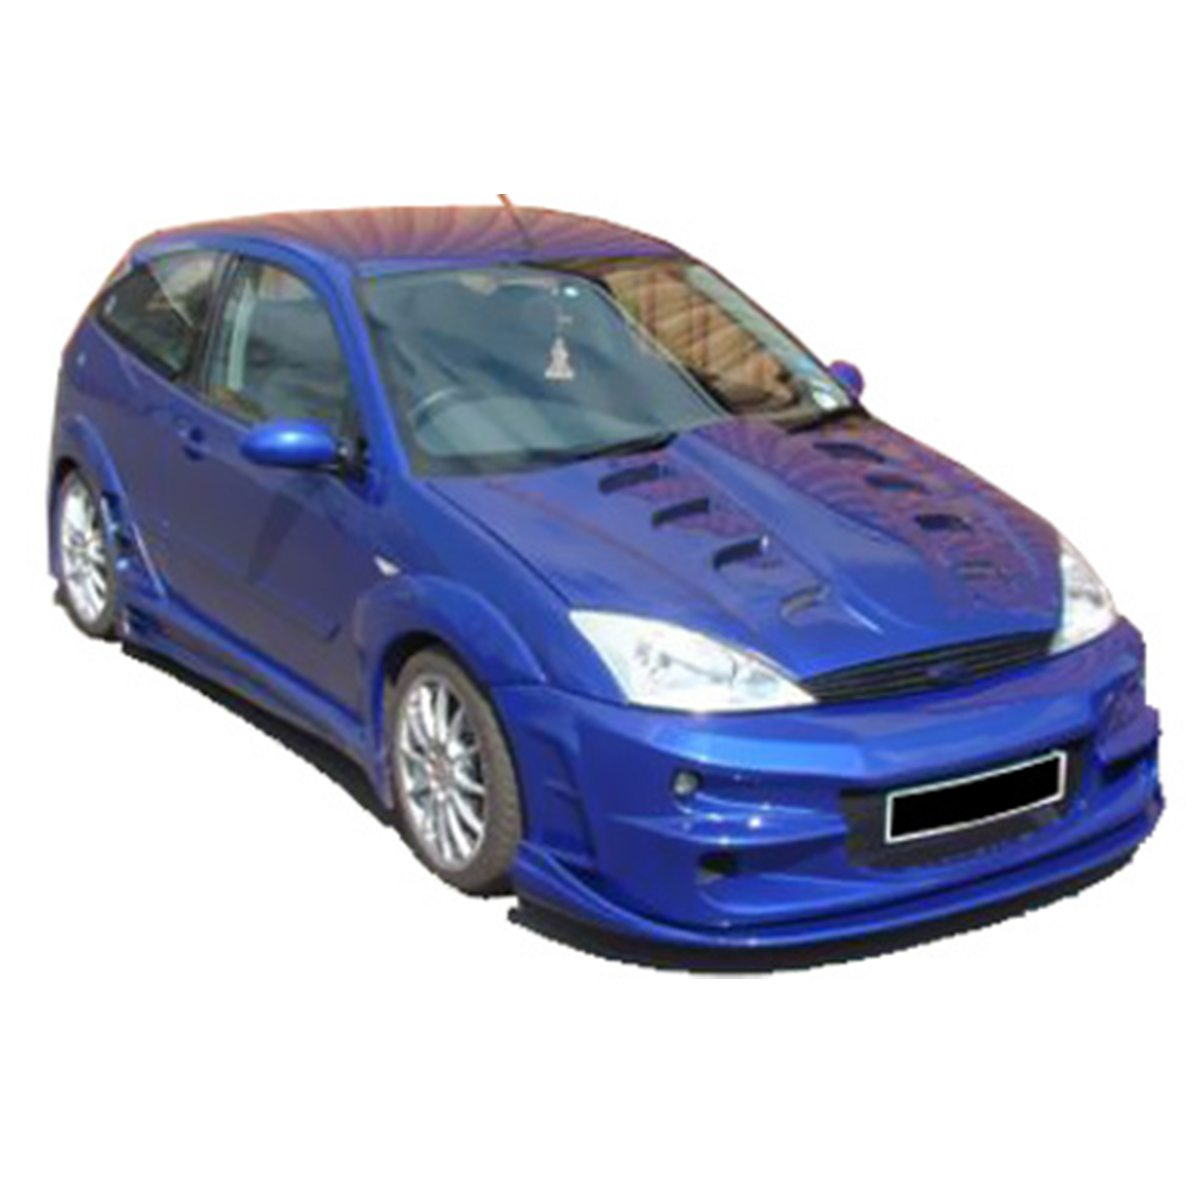 Ford-Focus-BadBoy-Wide-frt-PCA036